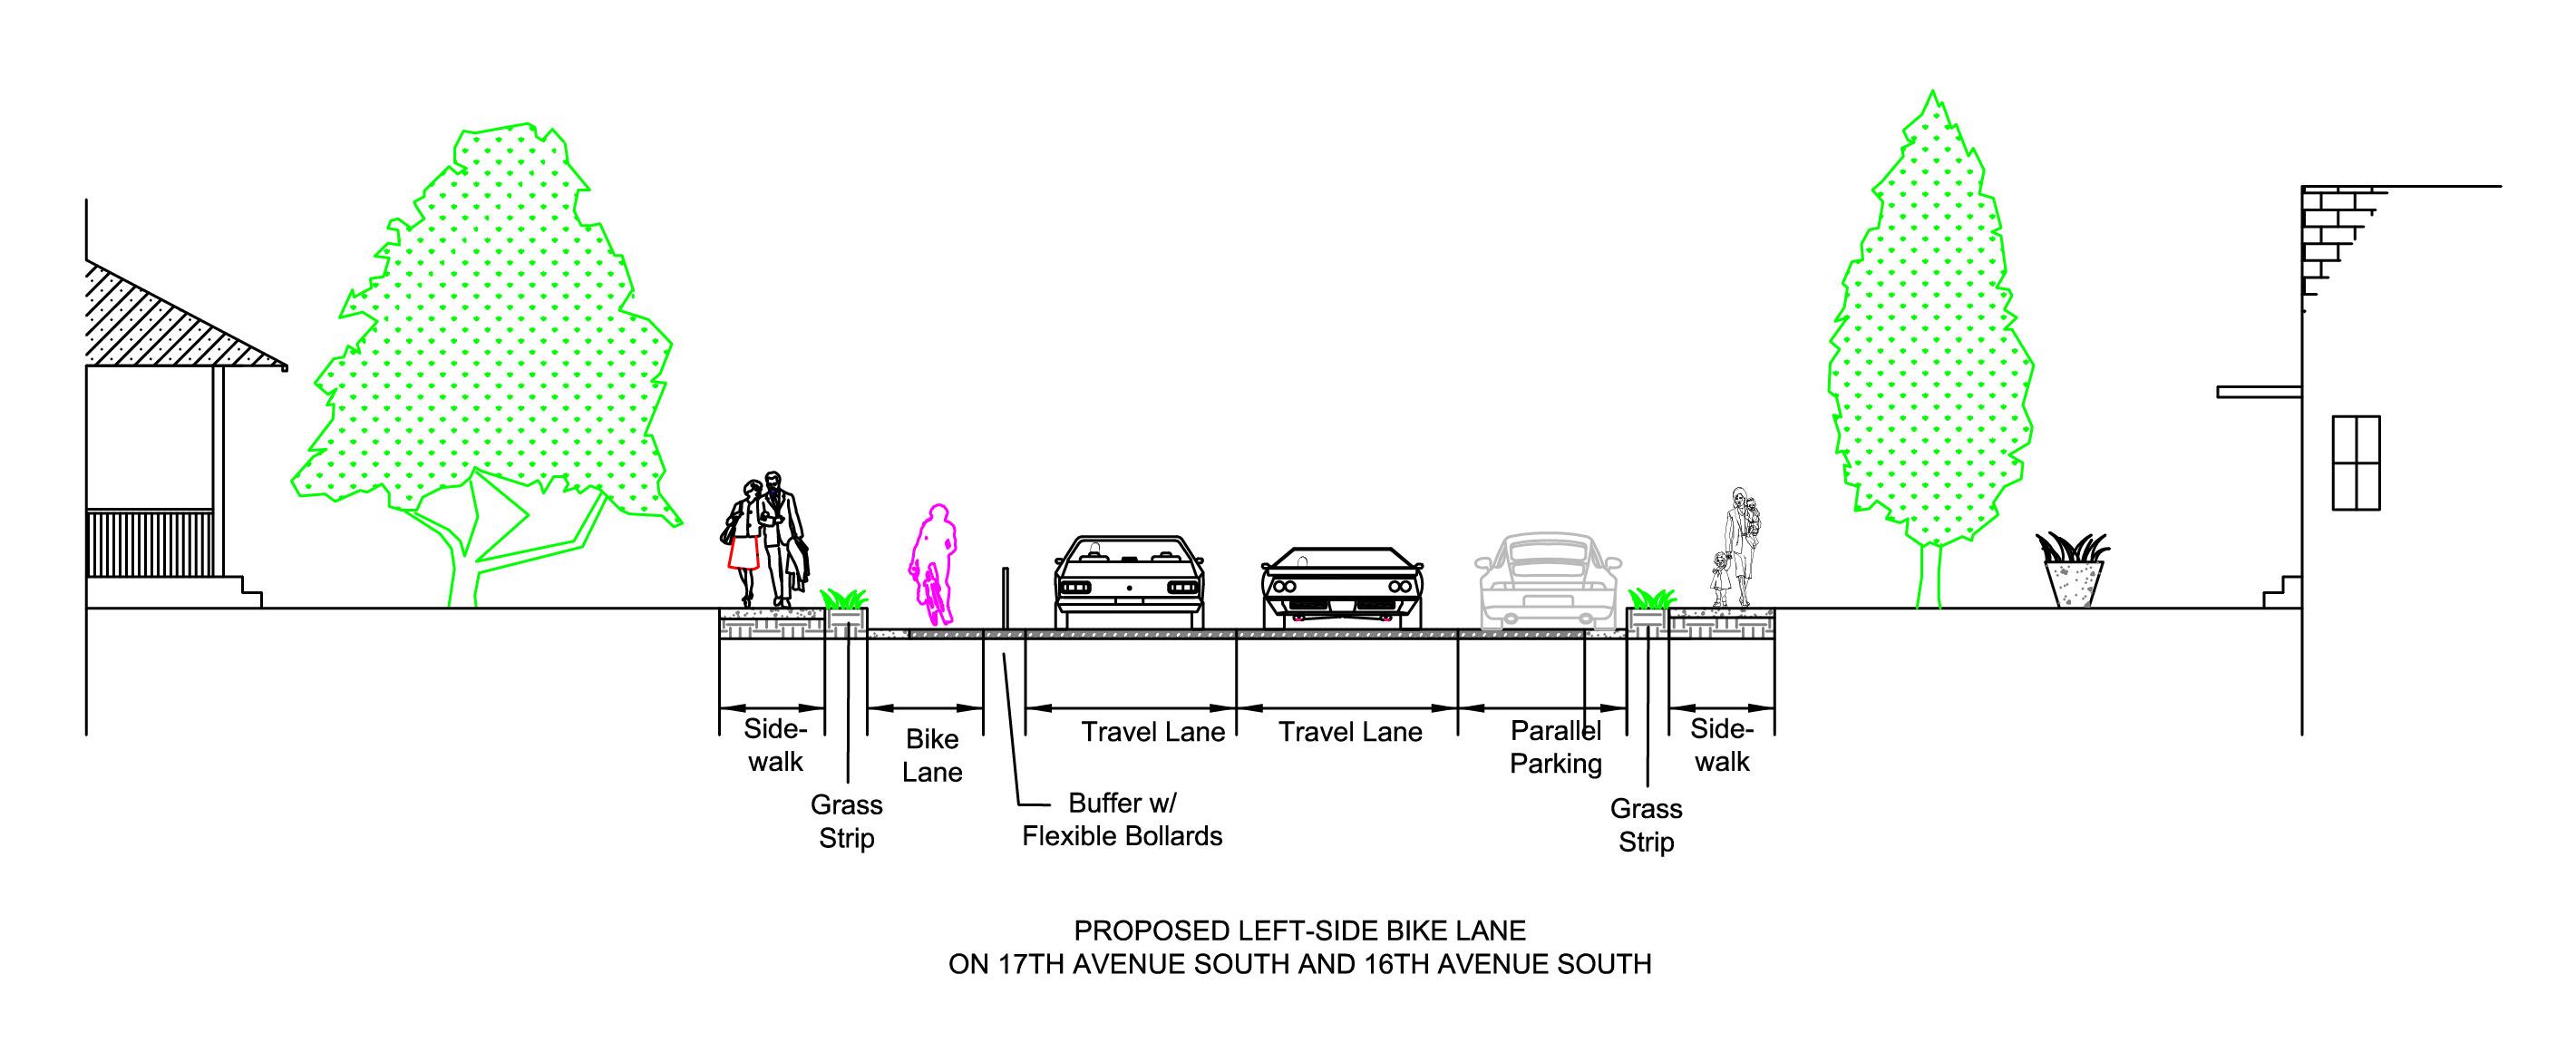 Proposed_Left-Side_Bike_Lane_Cross-Sections-02.jpg